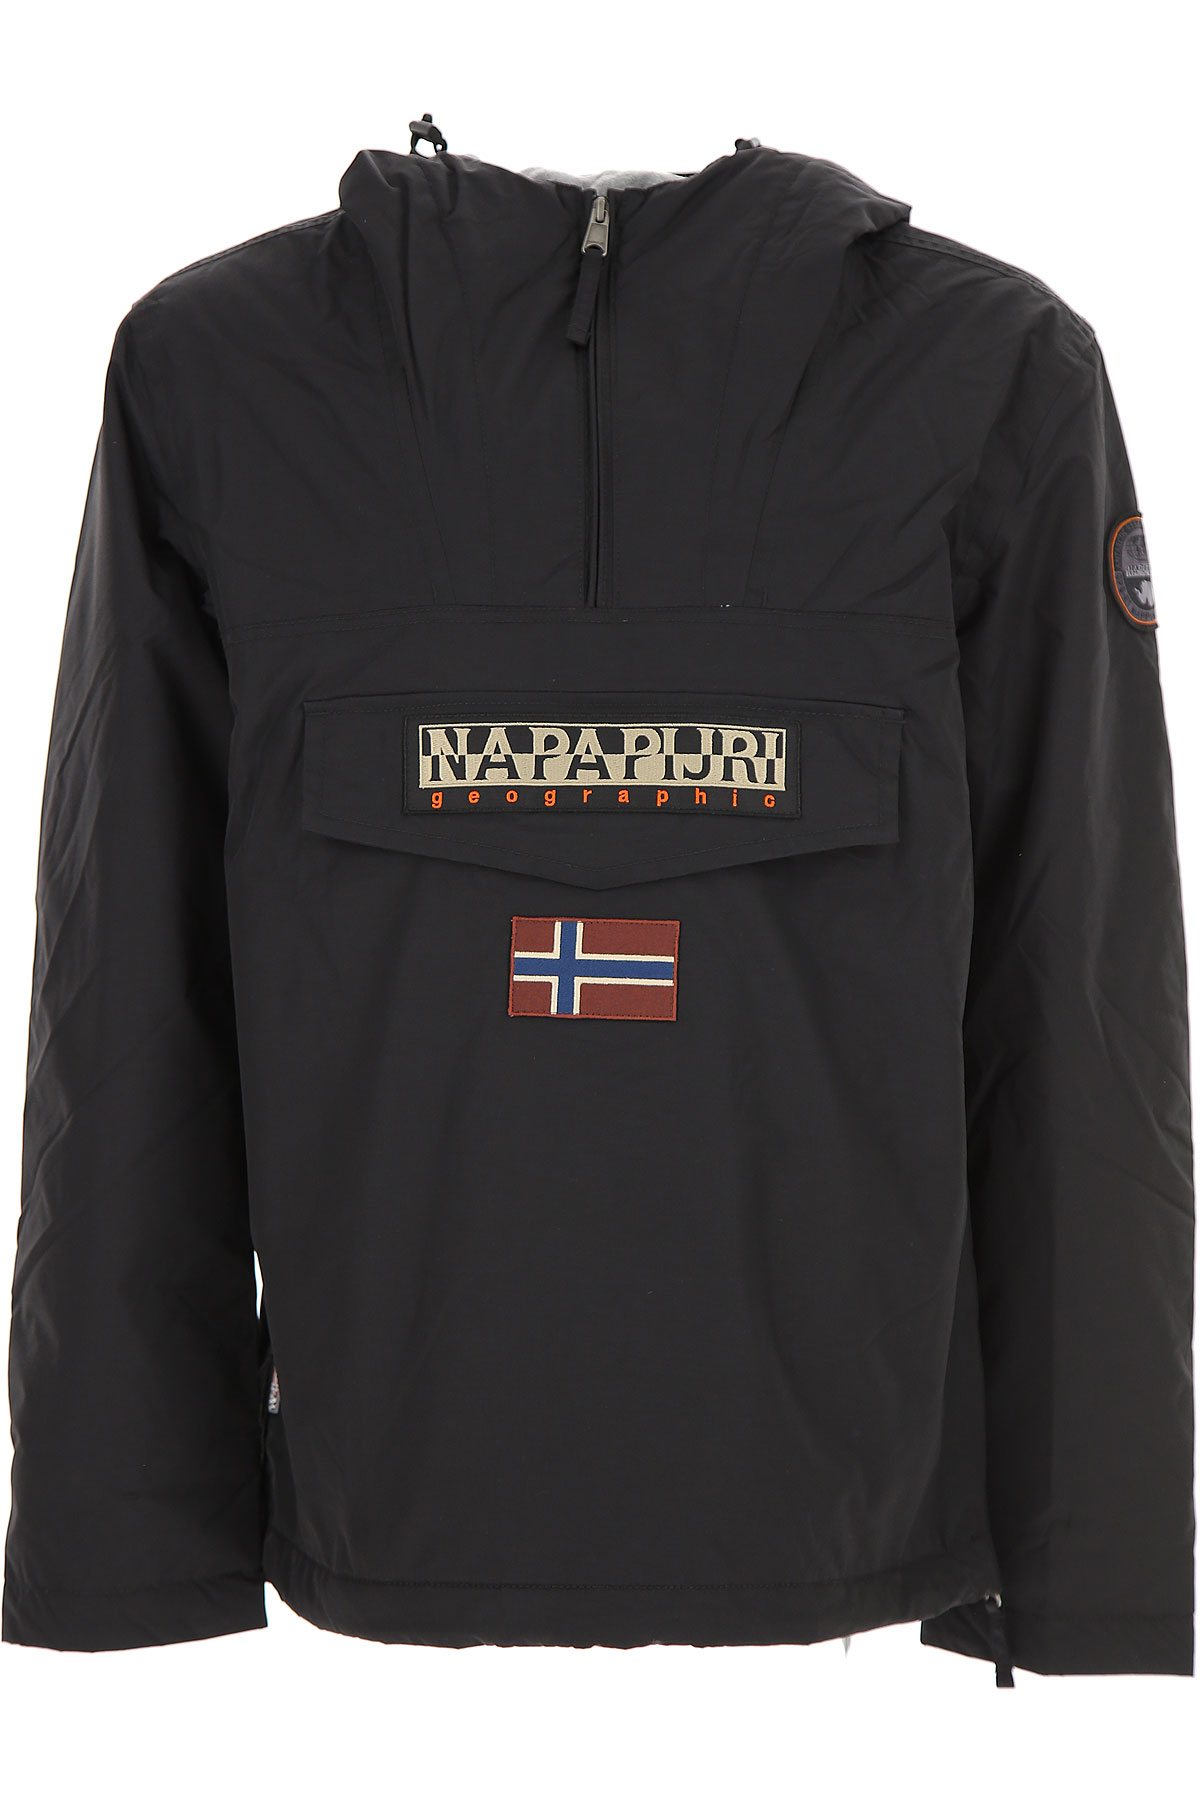 Image of Napapijri Down Jacket for Men, Puffer Ski Jacket, Black, poliestere, 2017, L M S XL XS